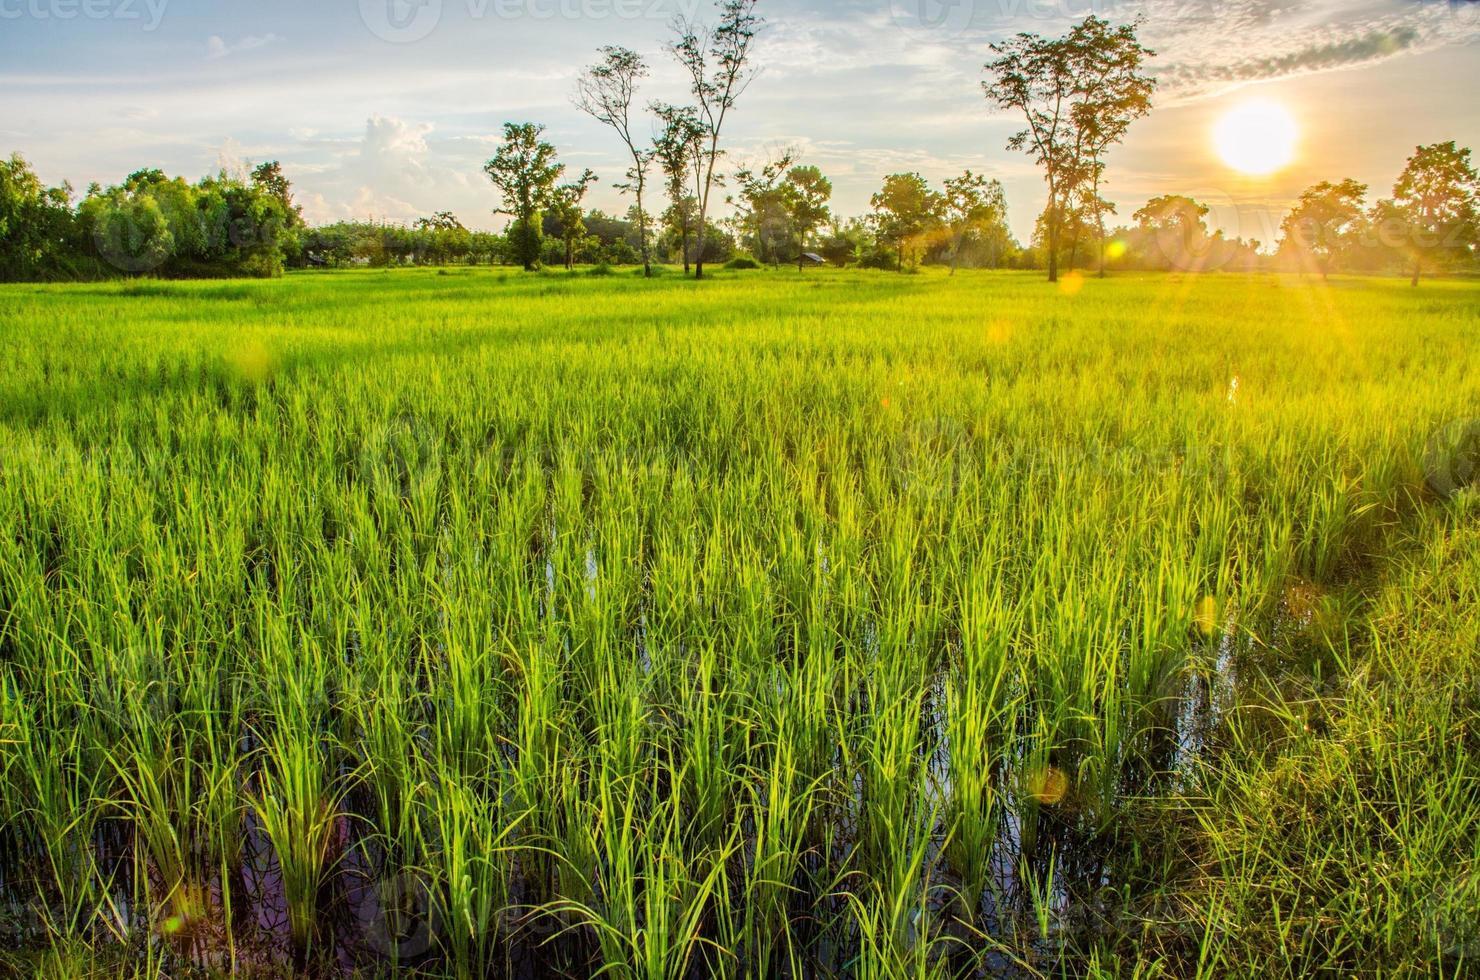 Sonnenuntergang auf Reisfeld foto